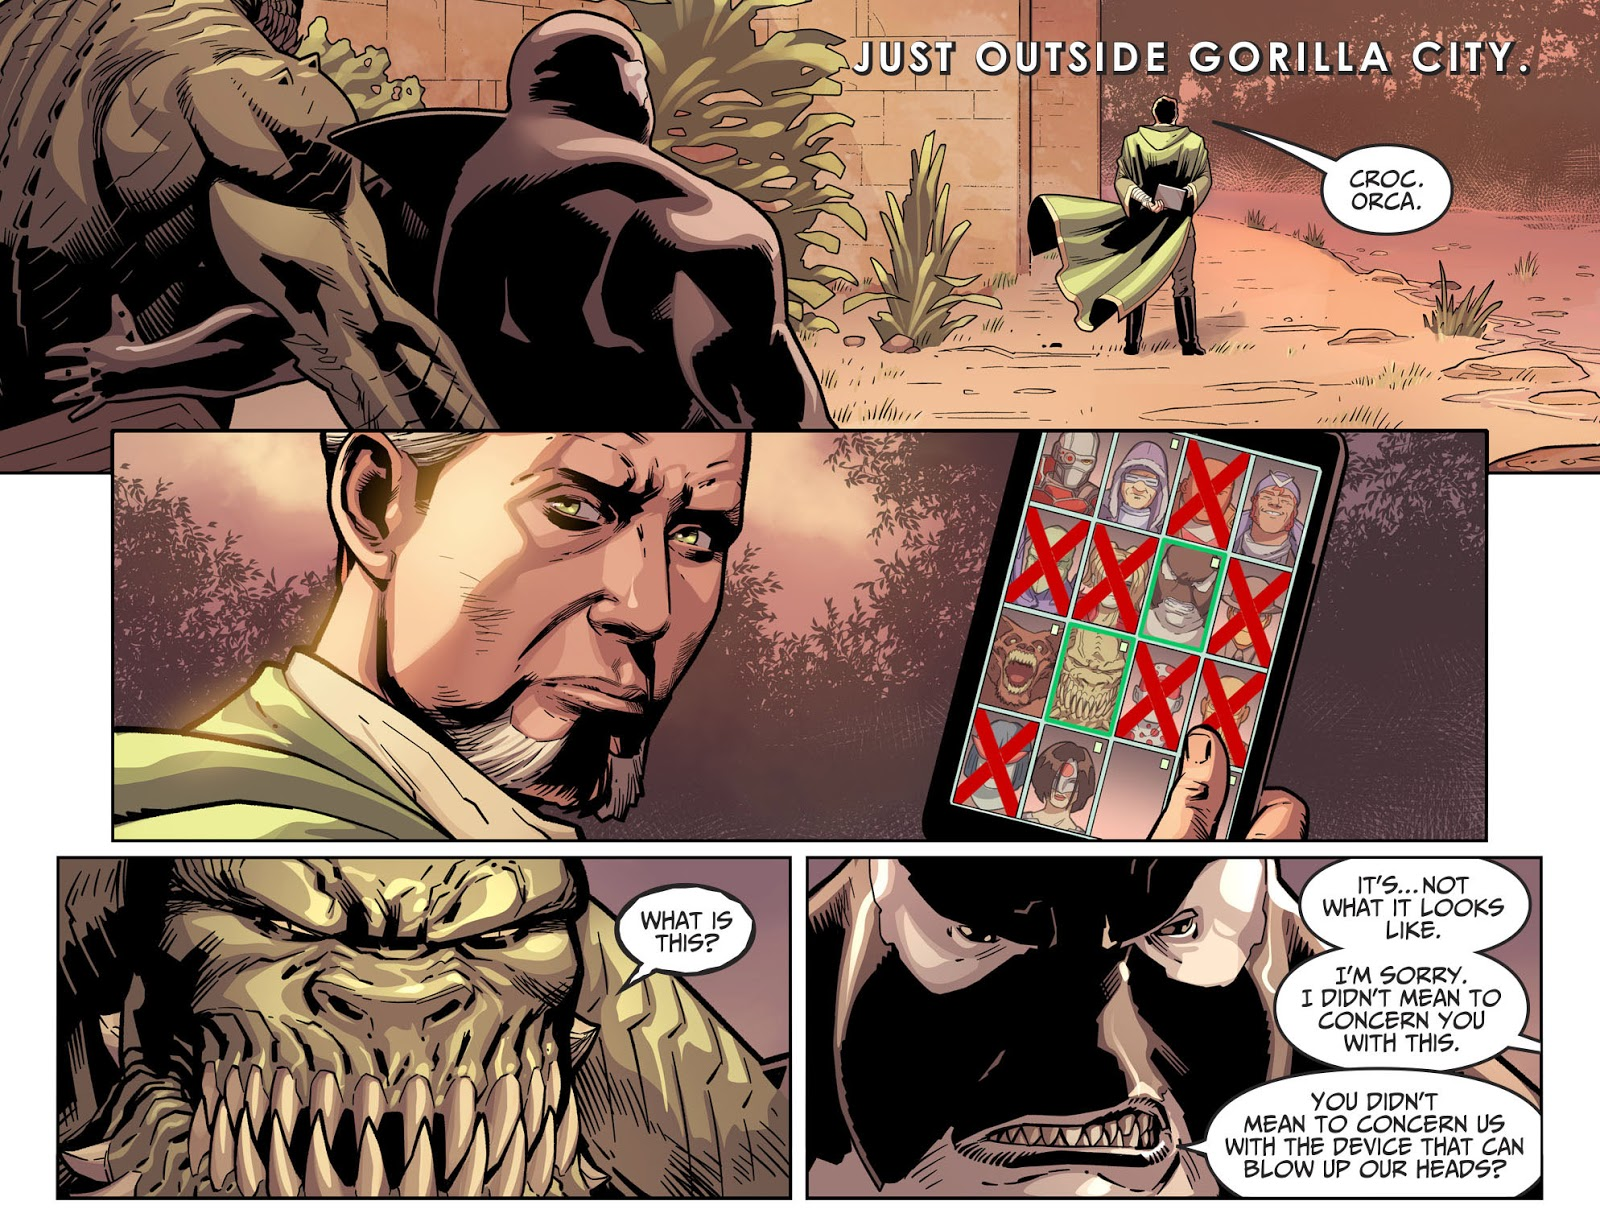 Killer Croc Bites Off Ra's Al Ghul's Hand (Injustice II)